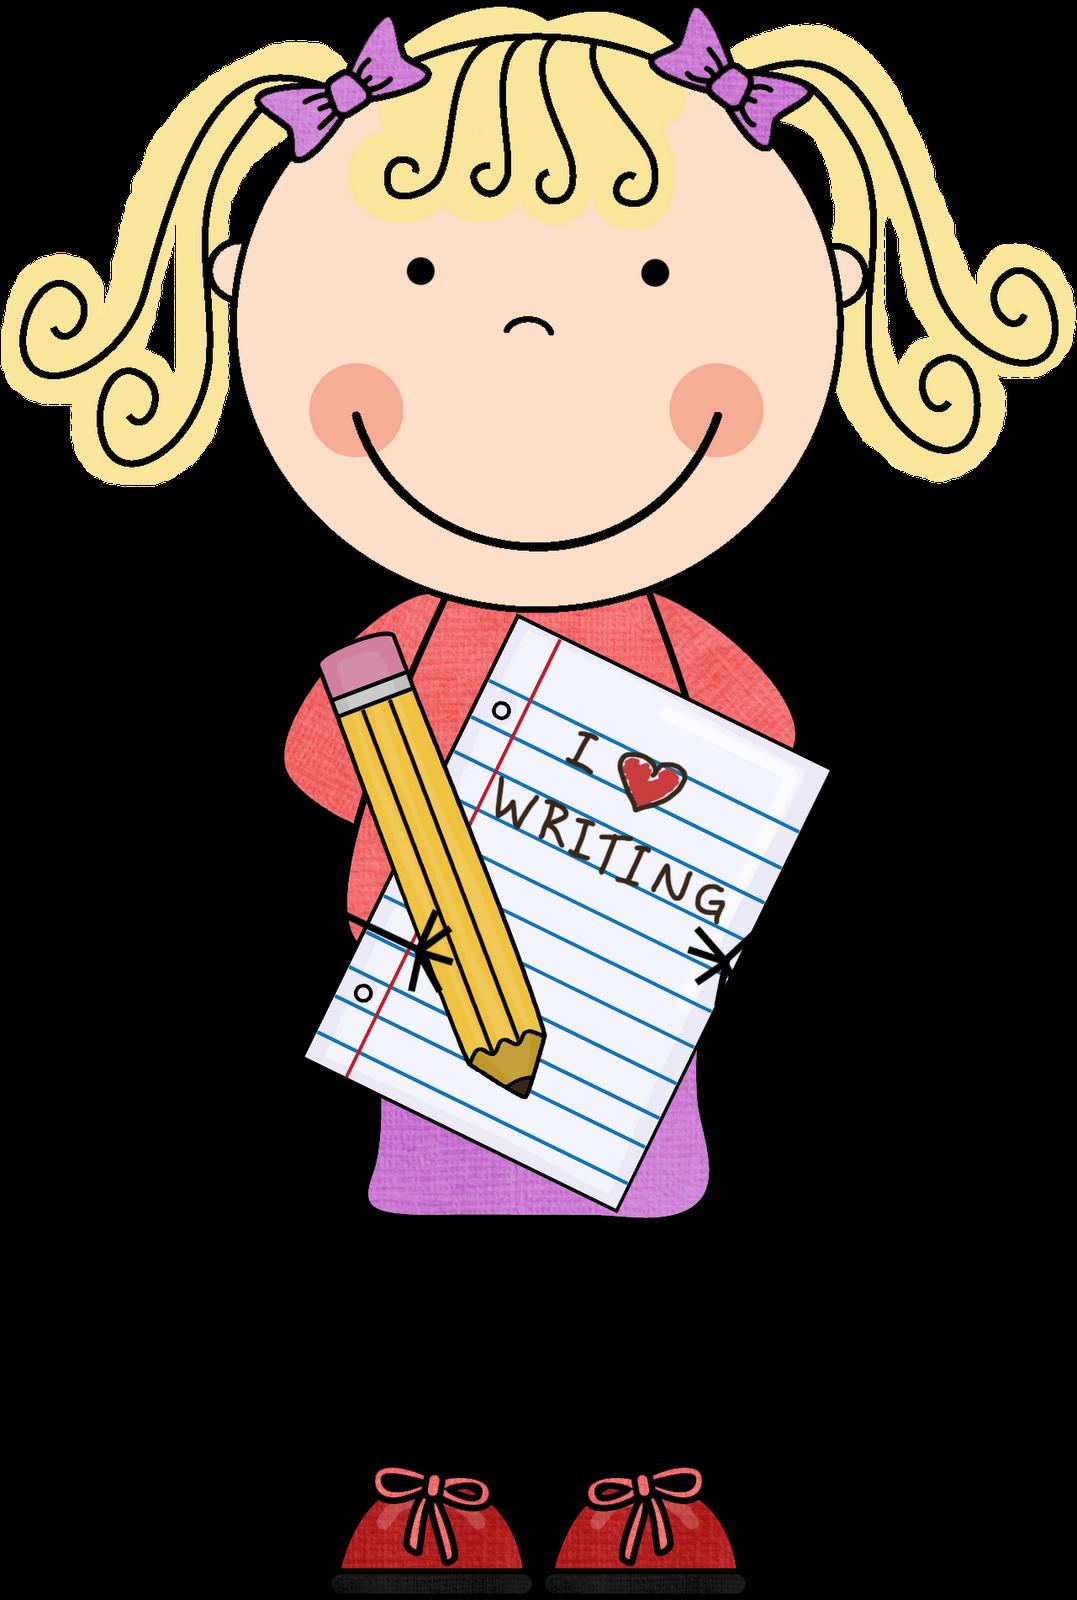 Handwriting practice clipart 2